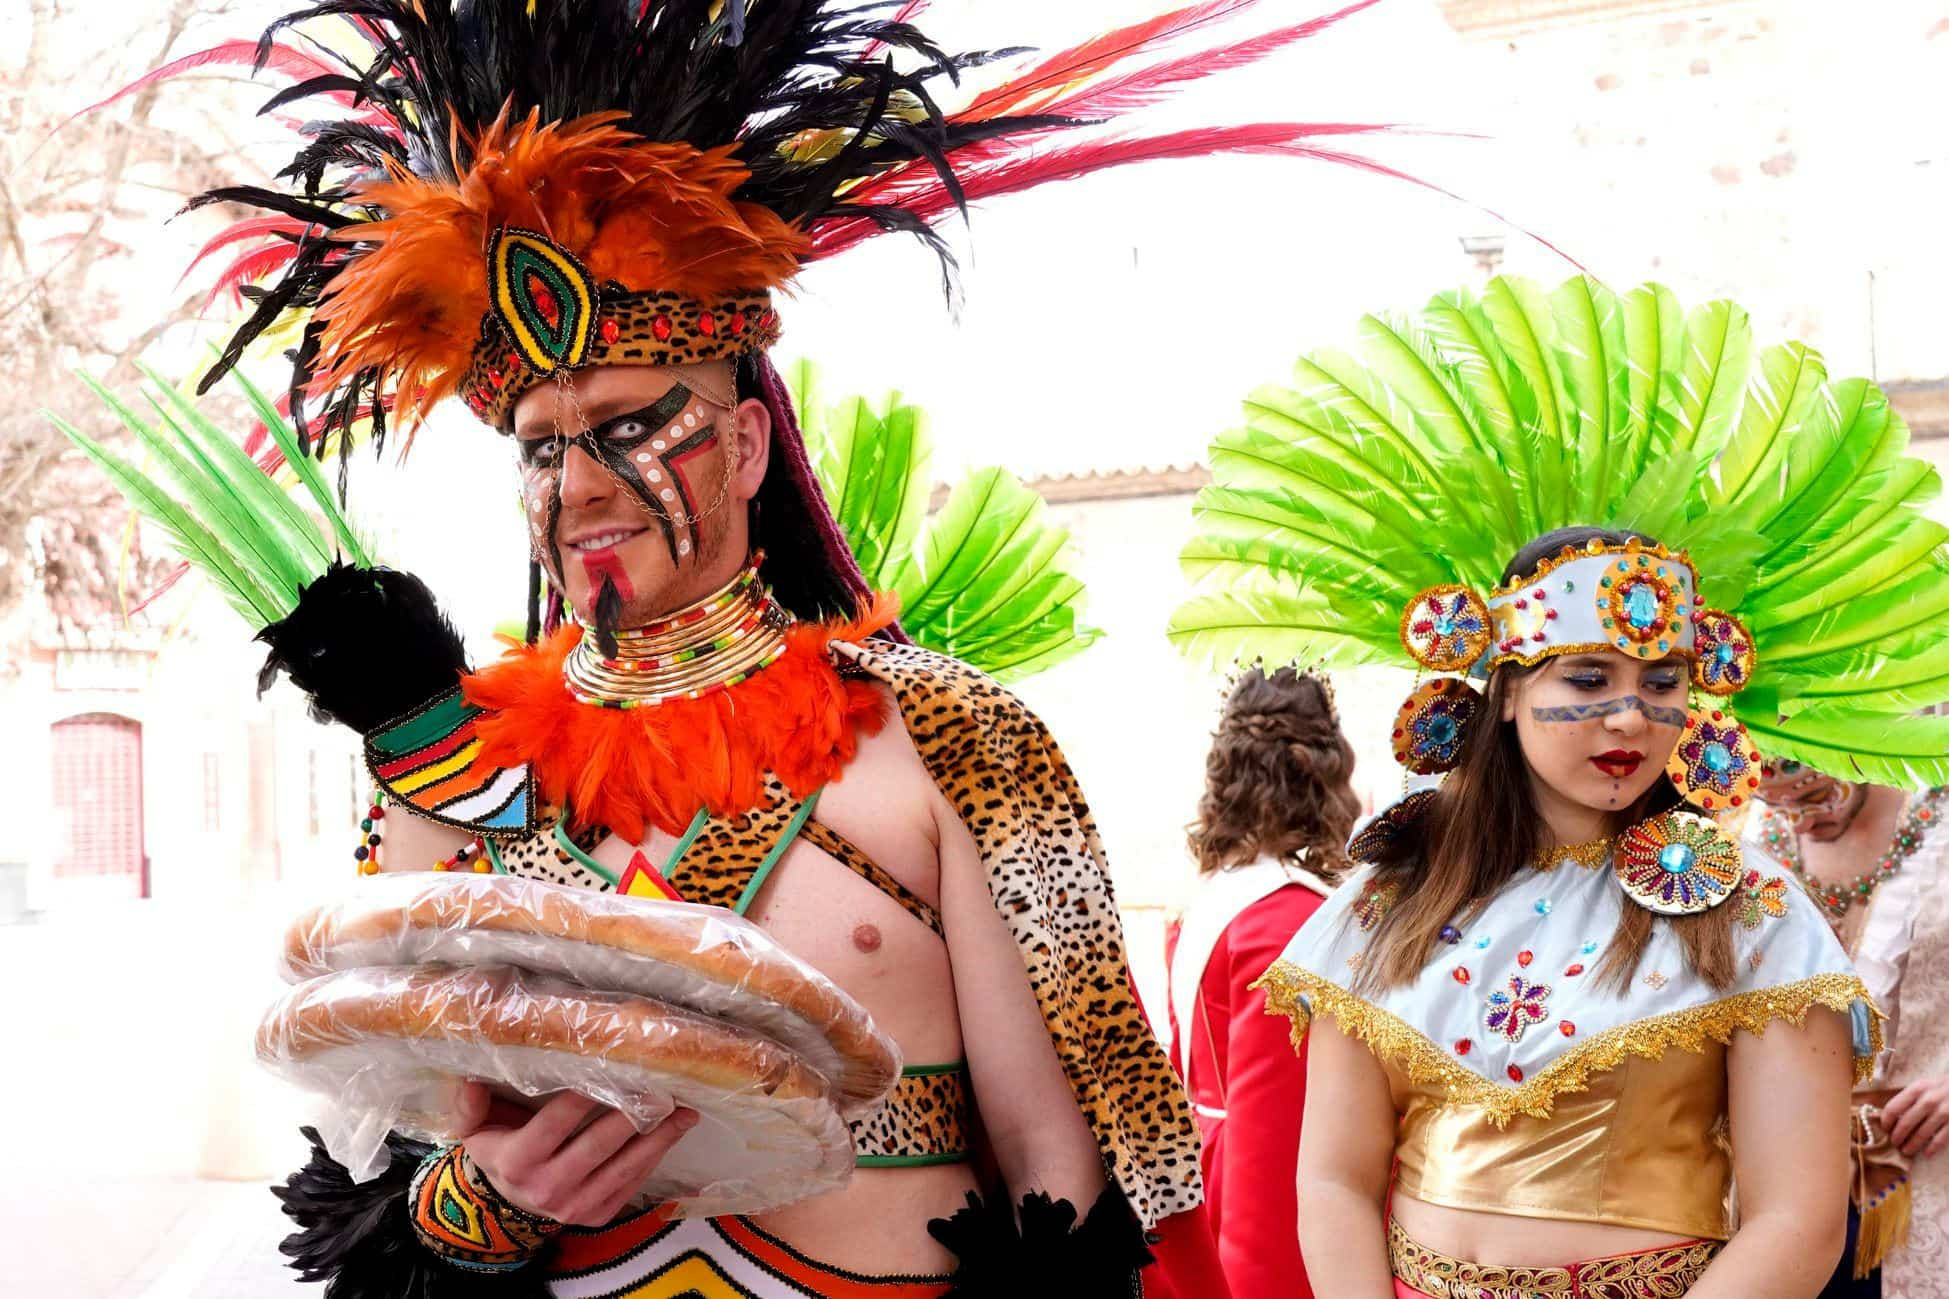 Carnaval de herencia 2020 ofertorio 50 - Selección de fotografías del Ofertorio del Carnaval de Herencia